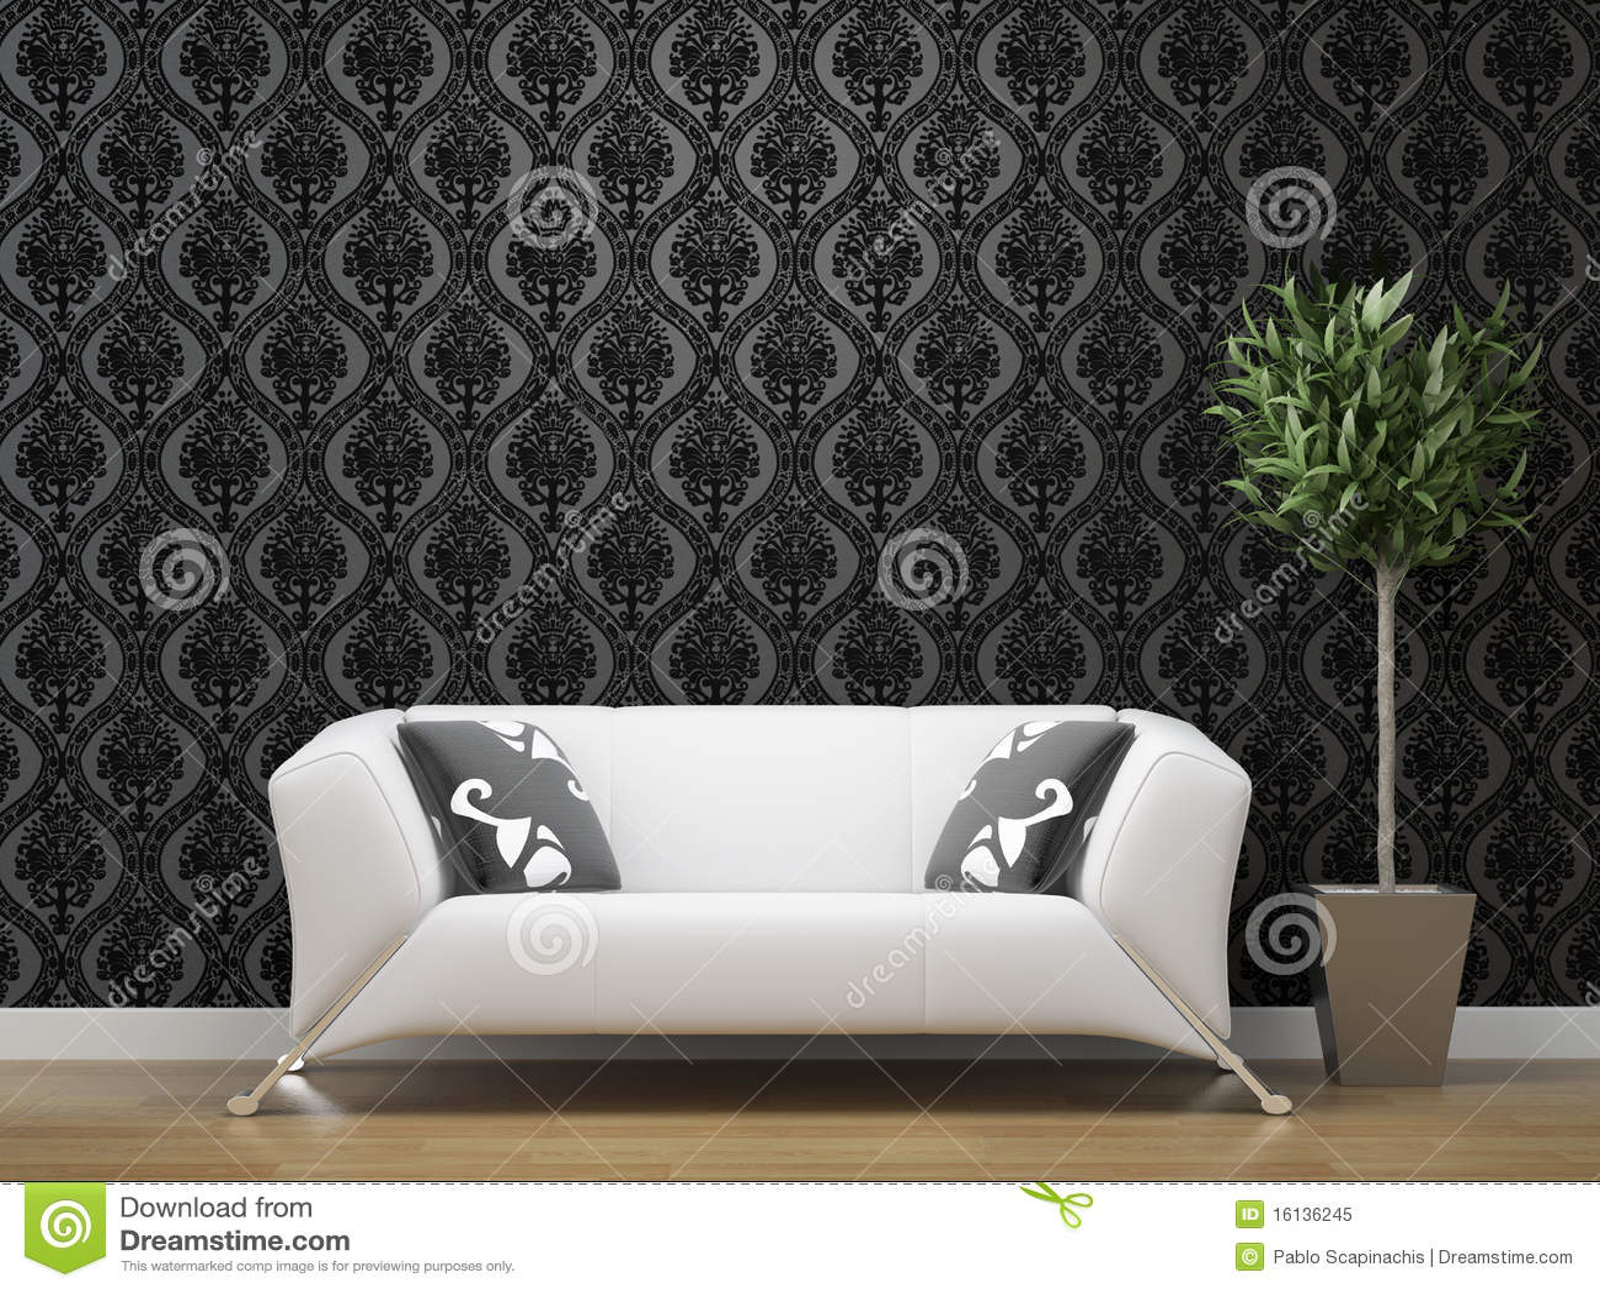 living room dark grey and silver wallpaper